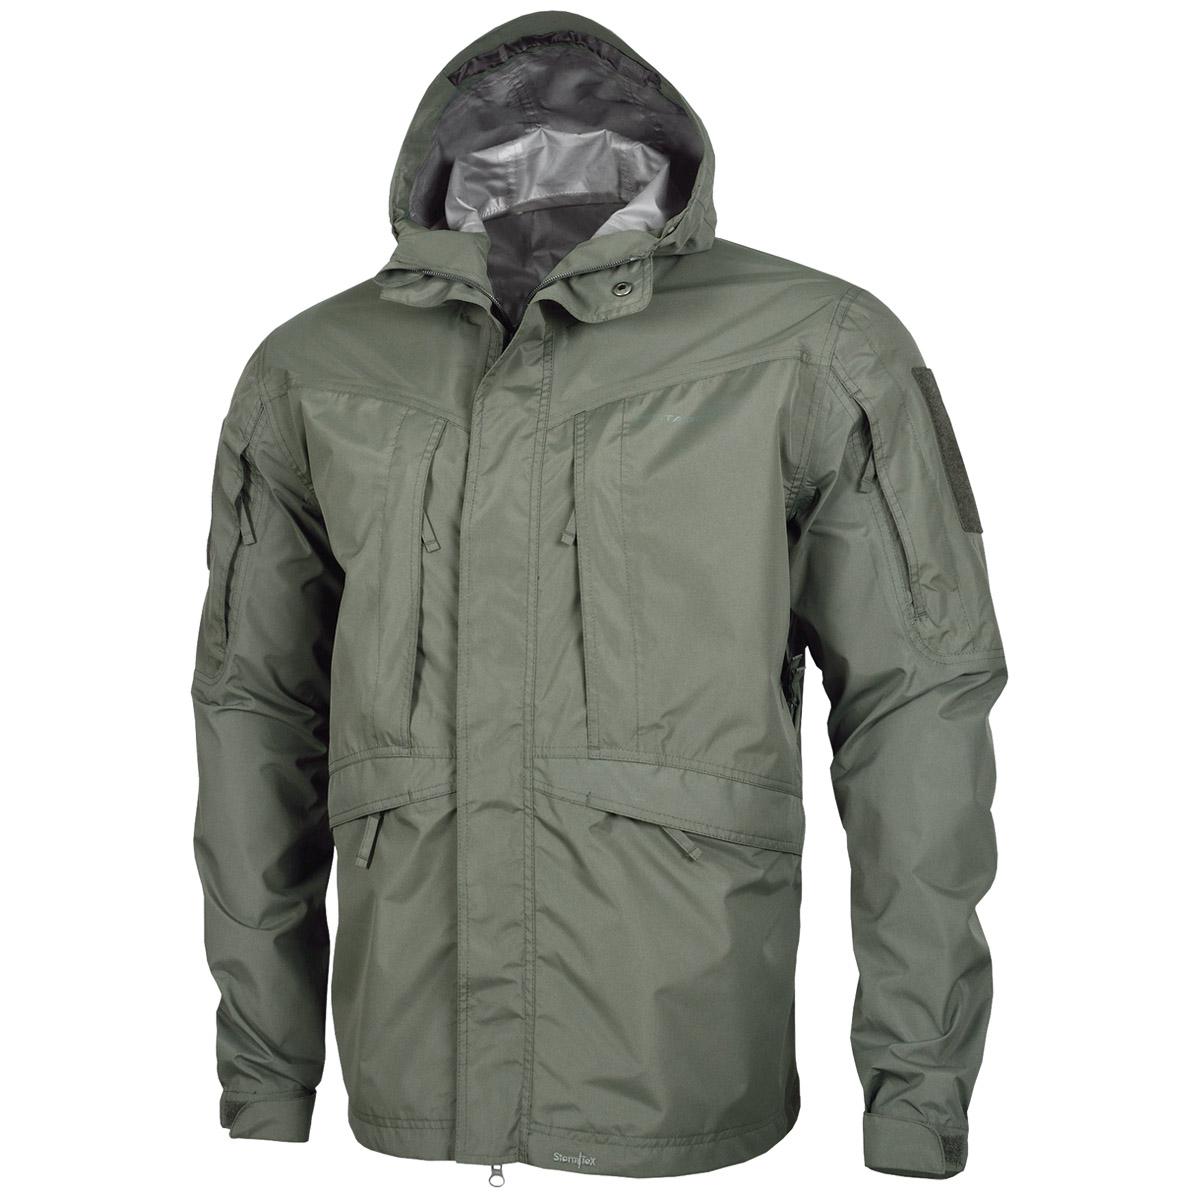 Pentagon Monsoon Tactical Soft Shell Mens Waterproof Jacket Hiking Grindle Green   EBay